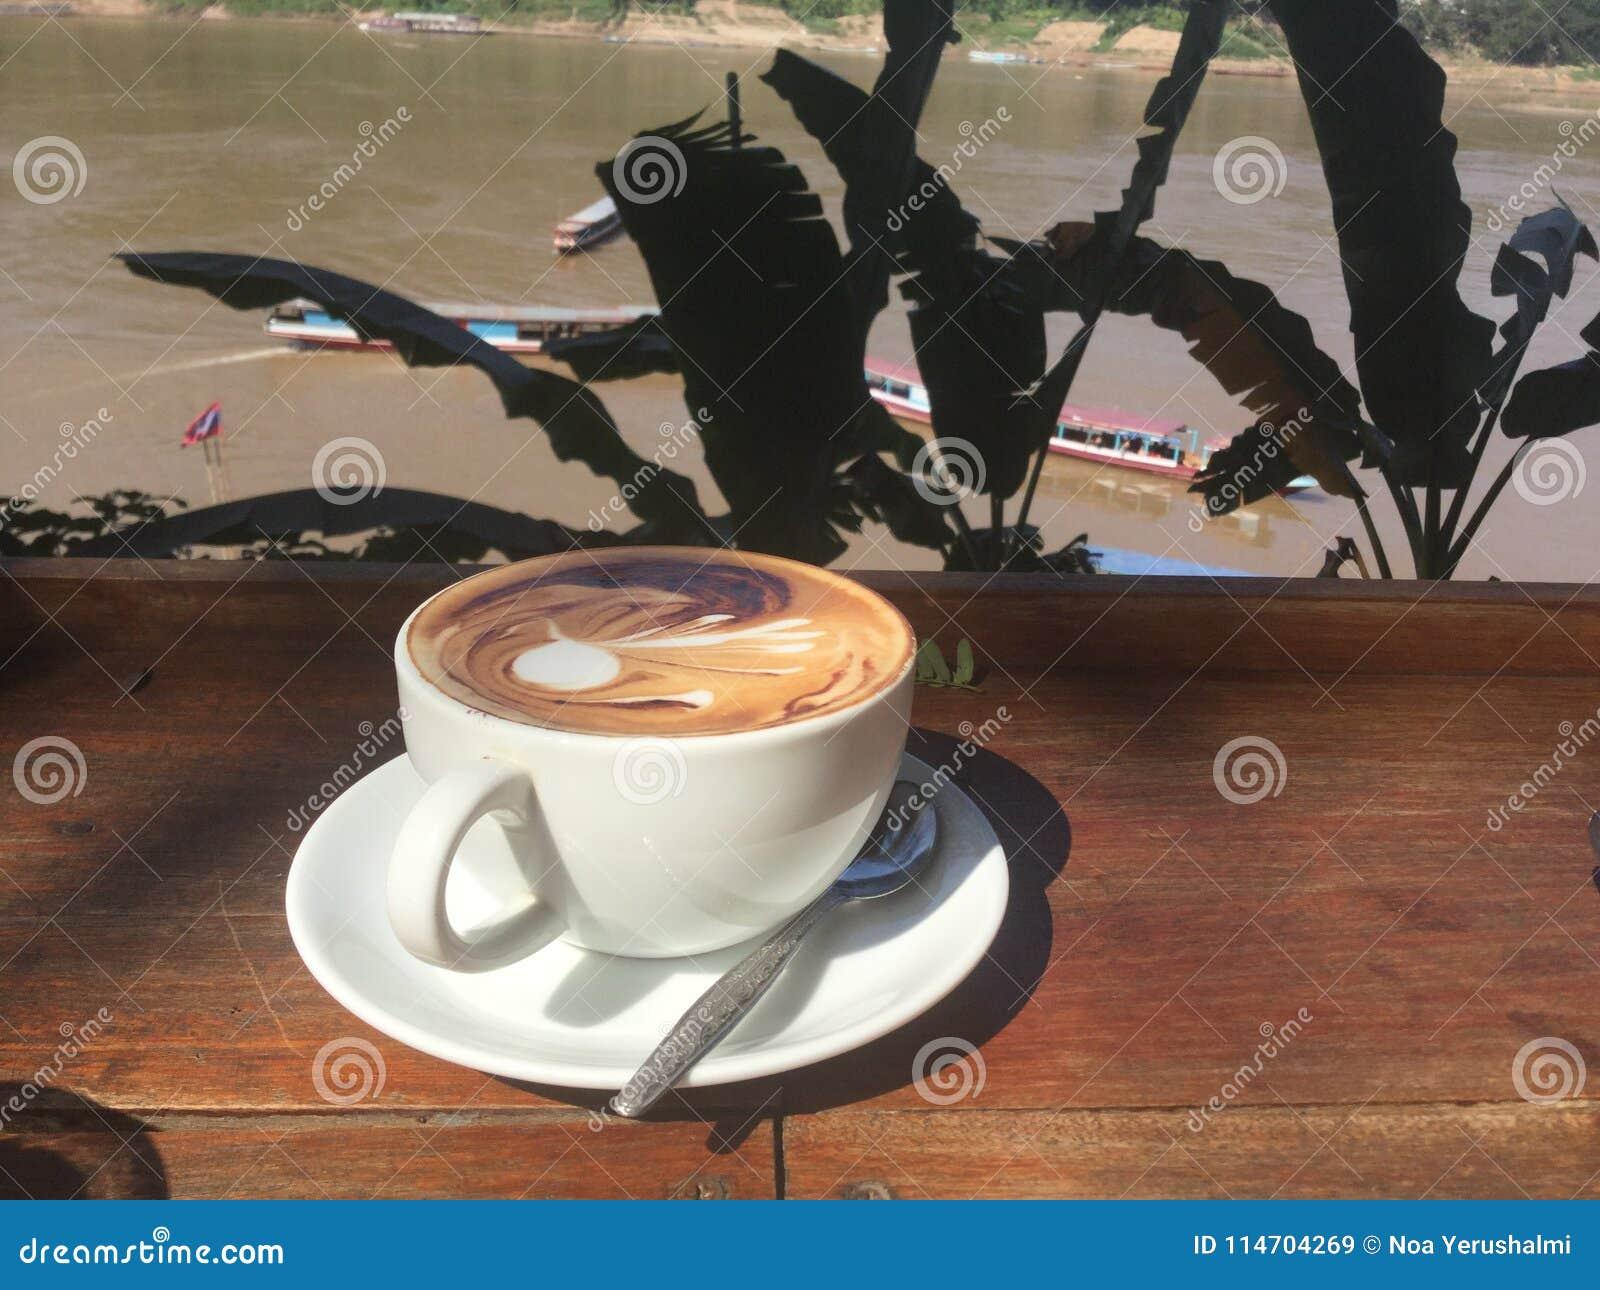 river kaffe